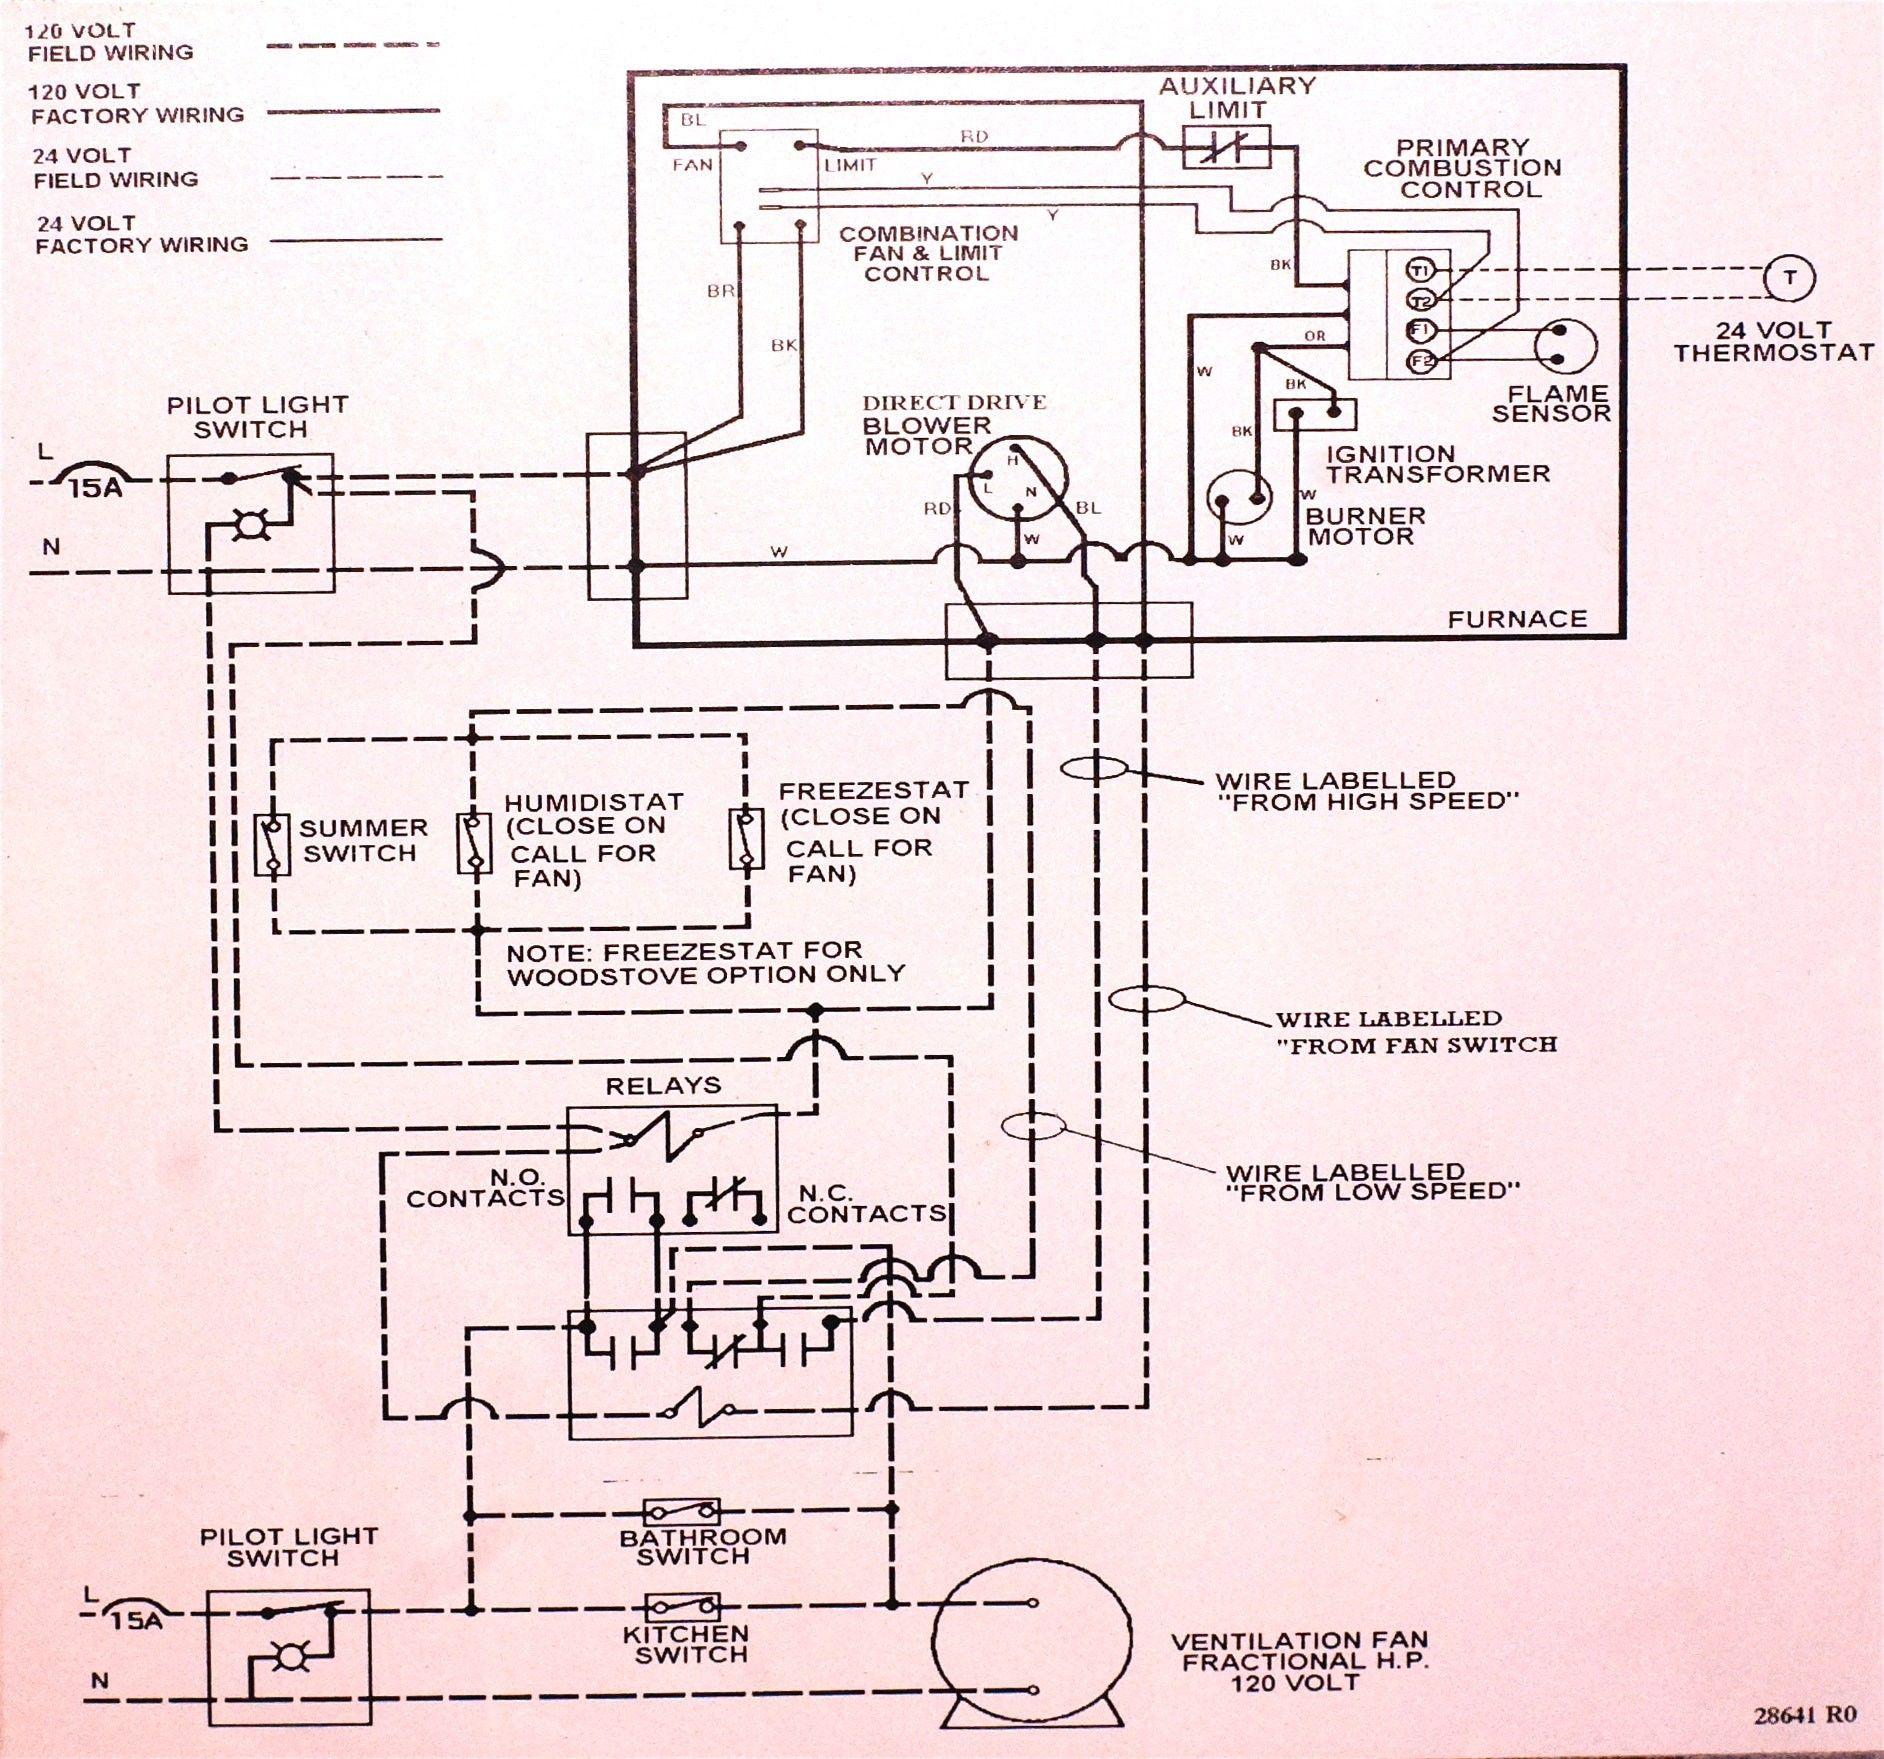 lovely wiring diagram gas furnace #diagrams #digramssample #diagramimages  #wiringdiagramsample #wiringdiagram c…   gas furnace, electric furnace, electrical  diagram  pinterest